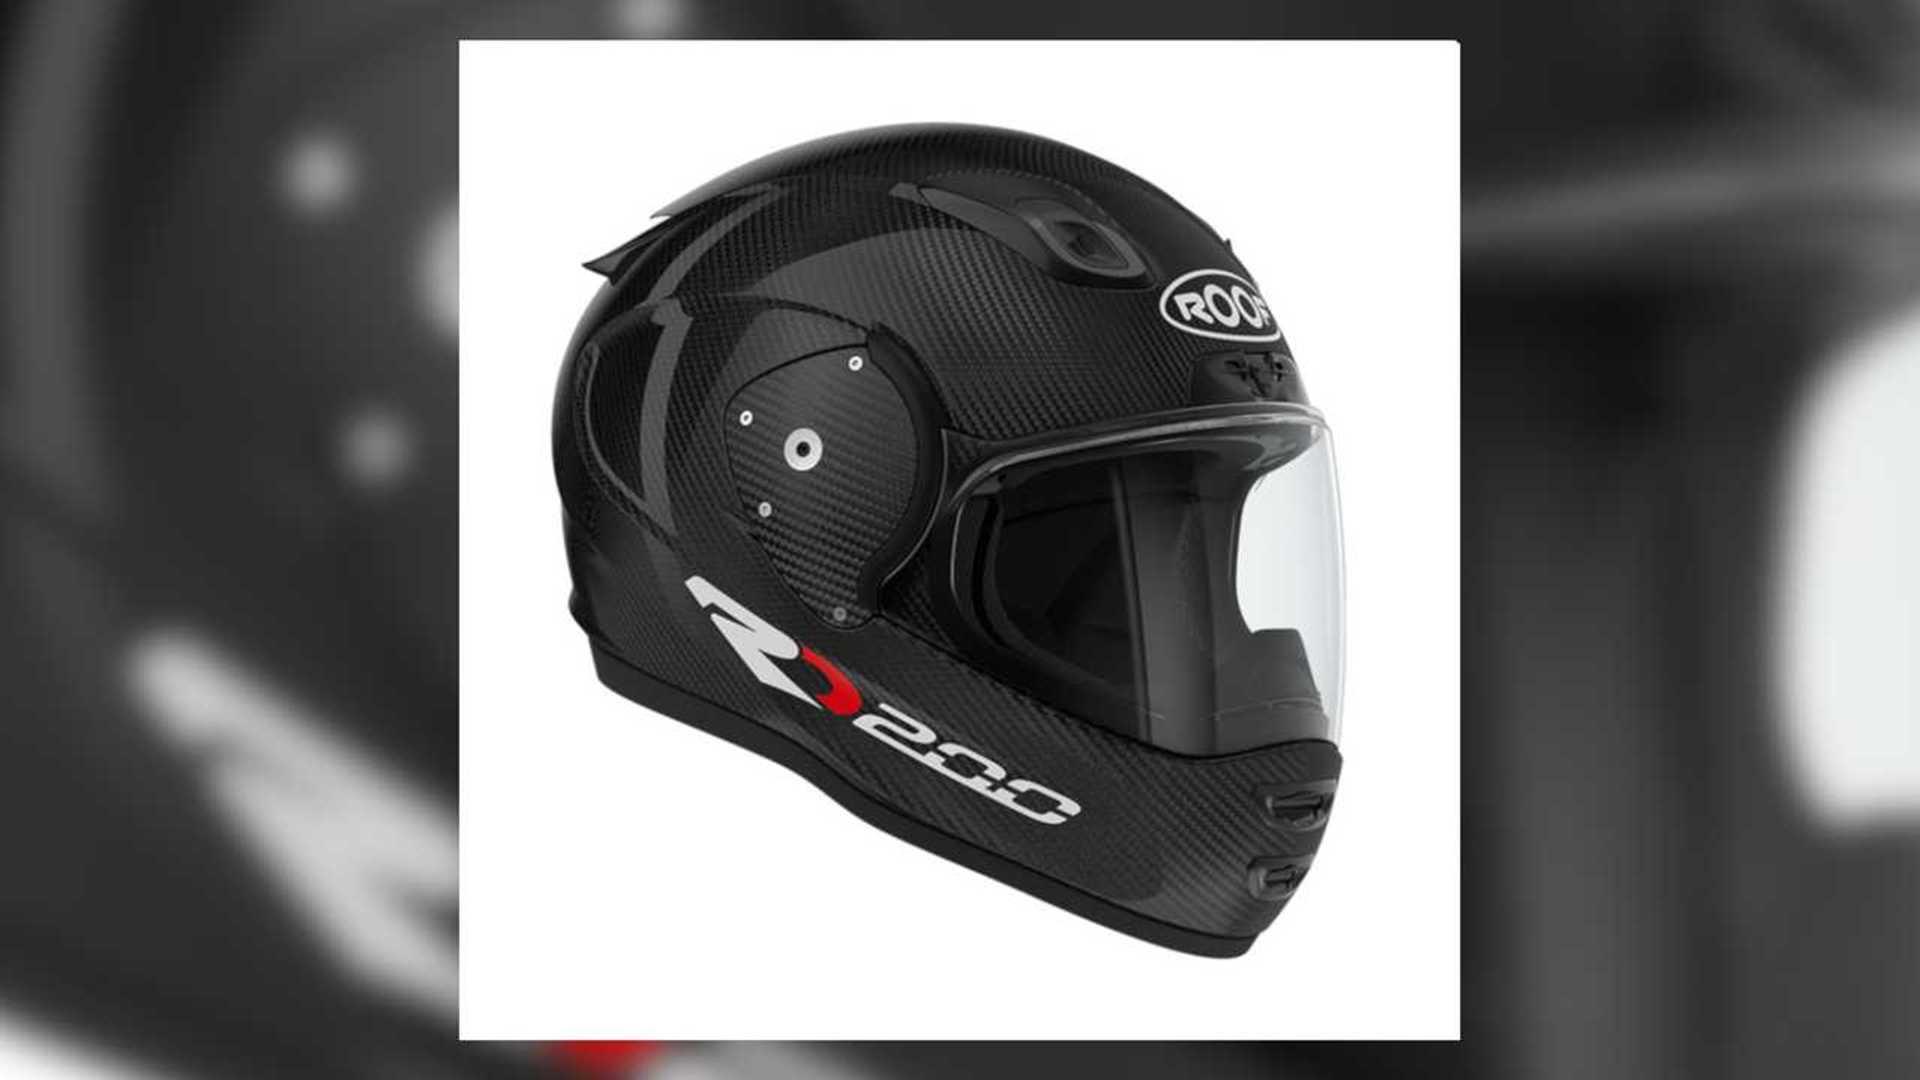 Is This New Carbon Fiber Helmet The Lightest Full-Face In The World?